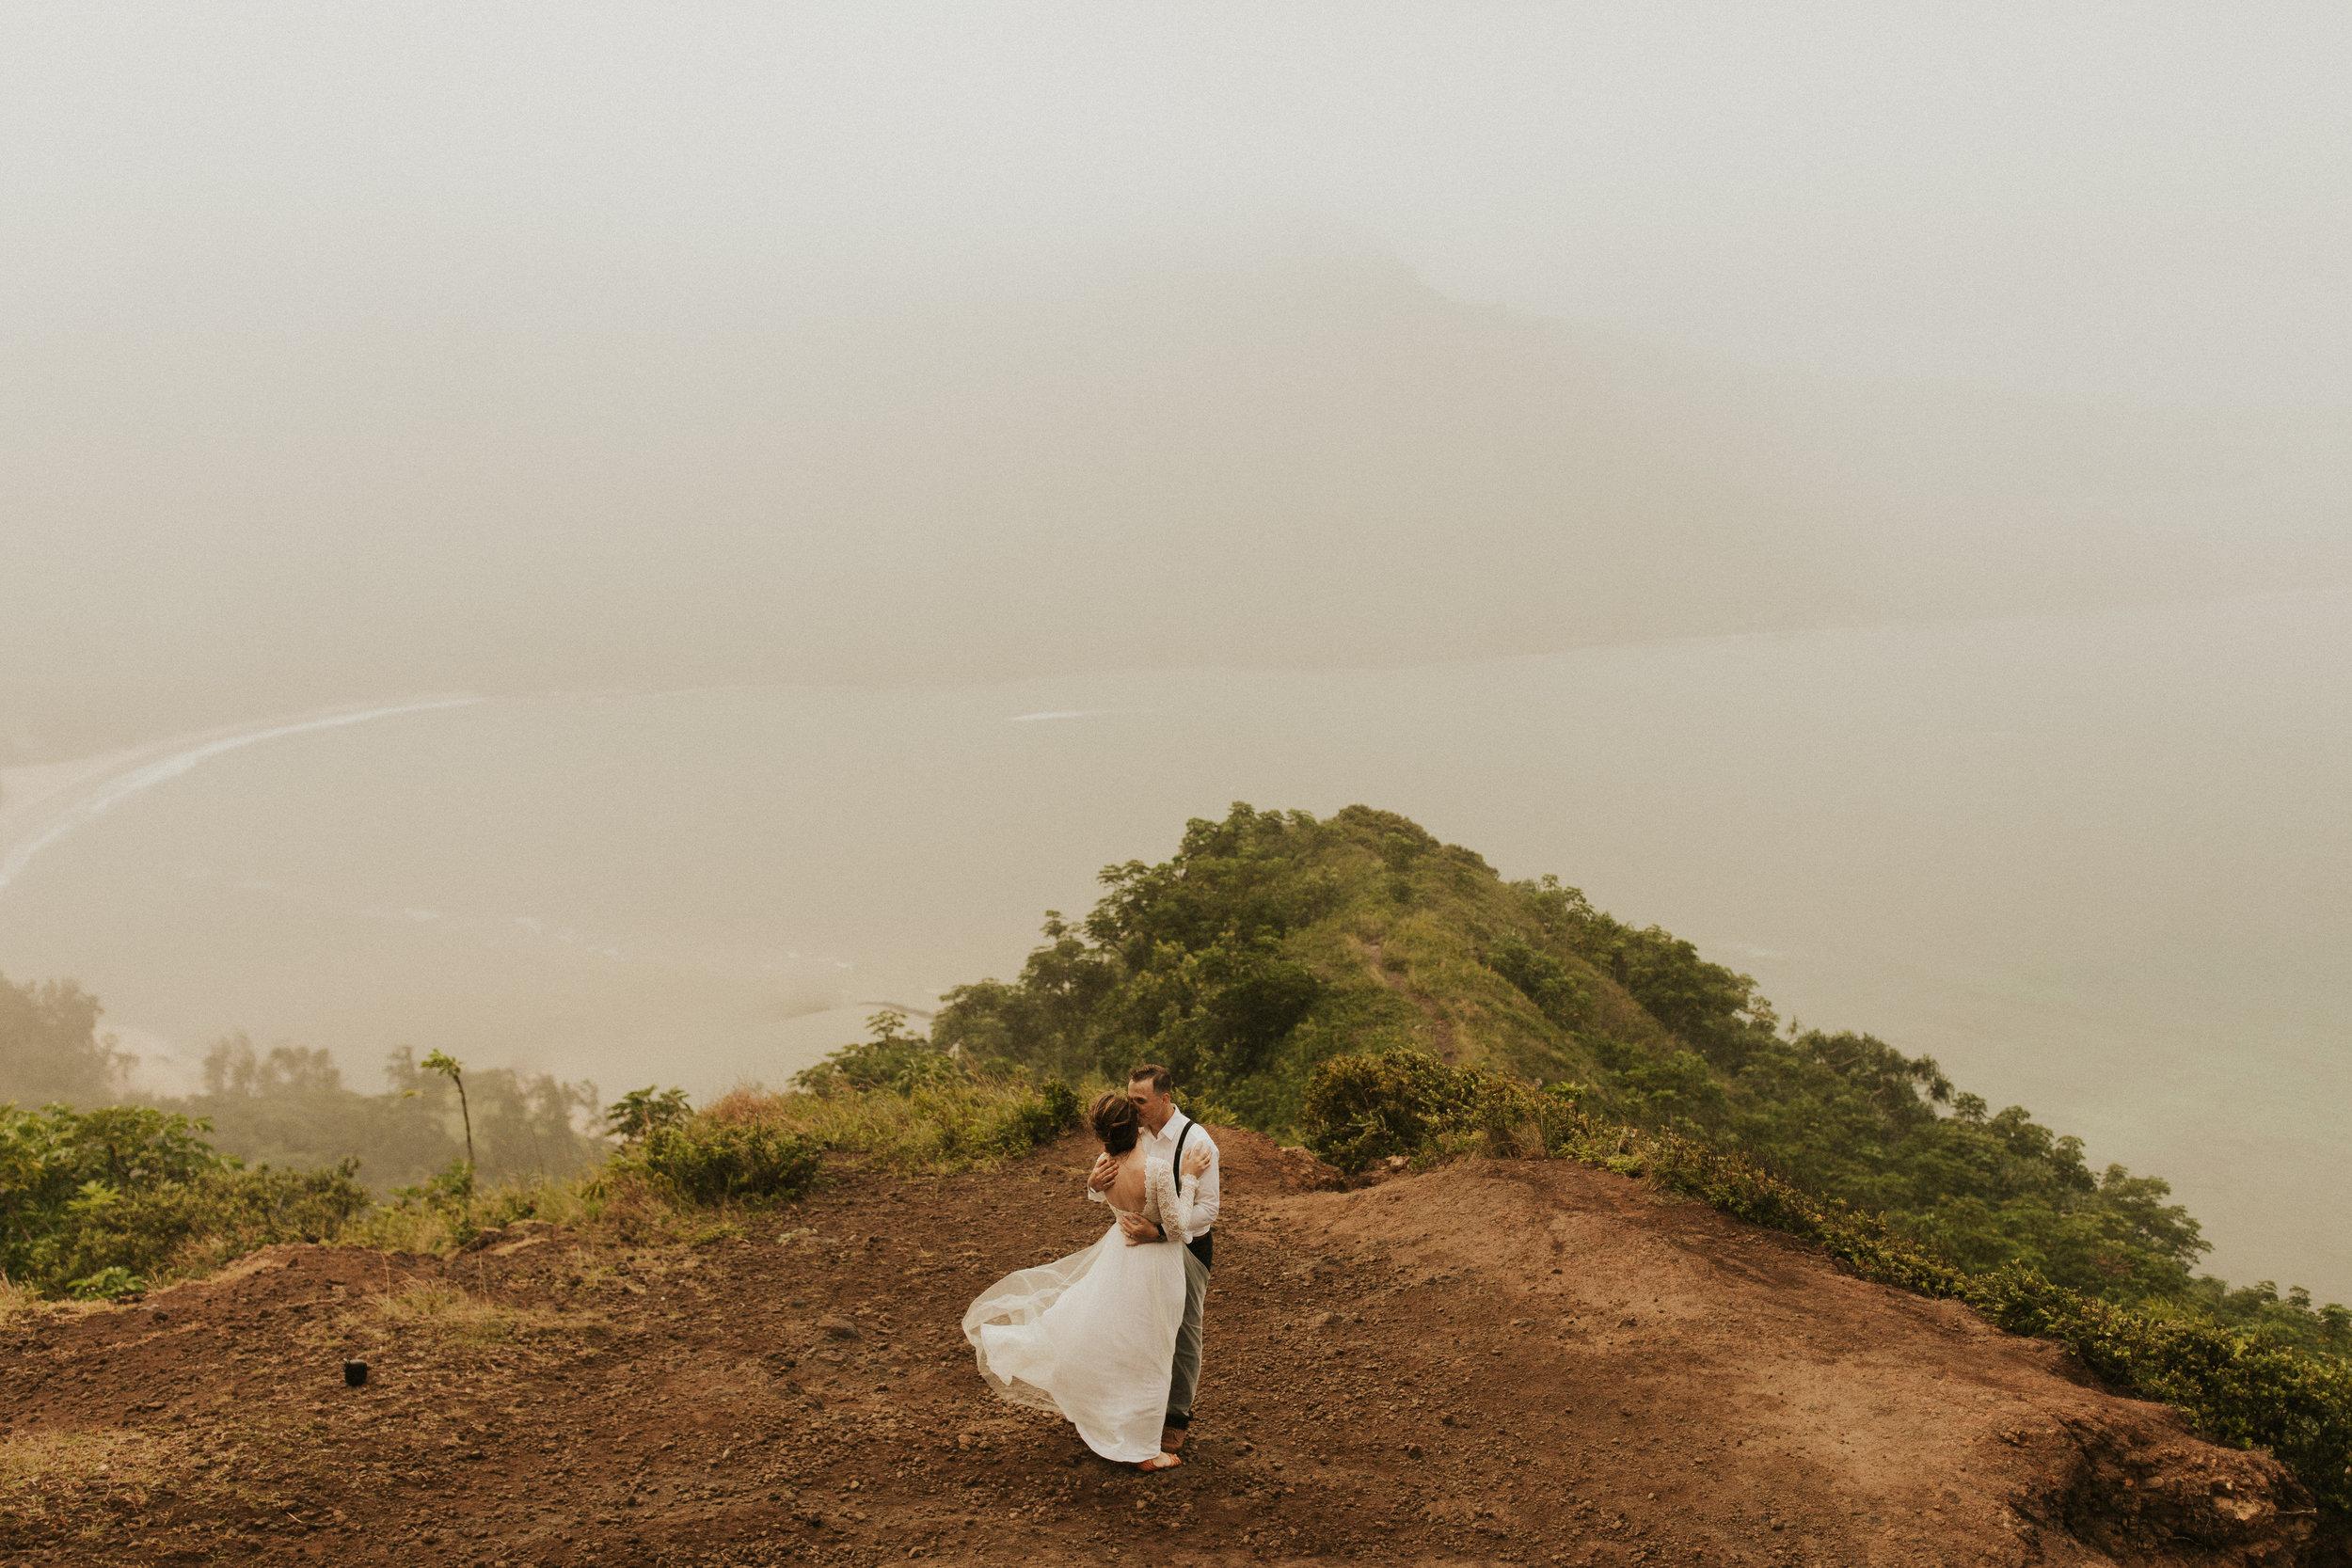 the-mclachlans-destination-elopement-photographers-mountain-hike-sena-eric-141.jpg